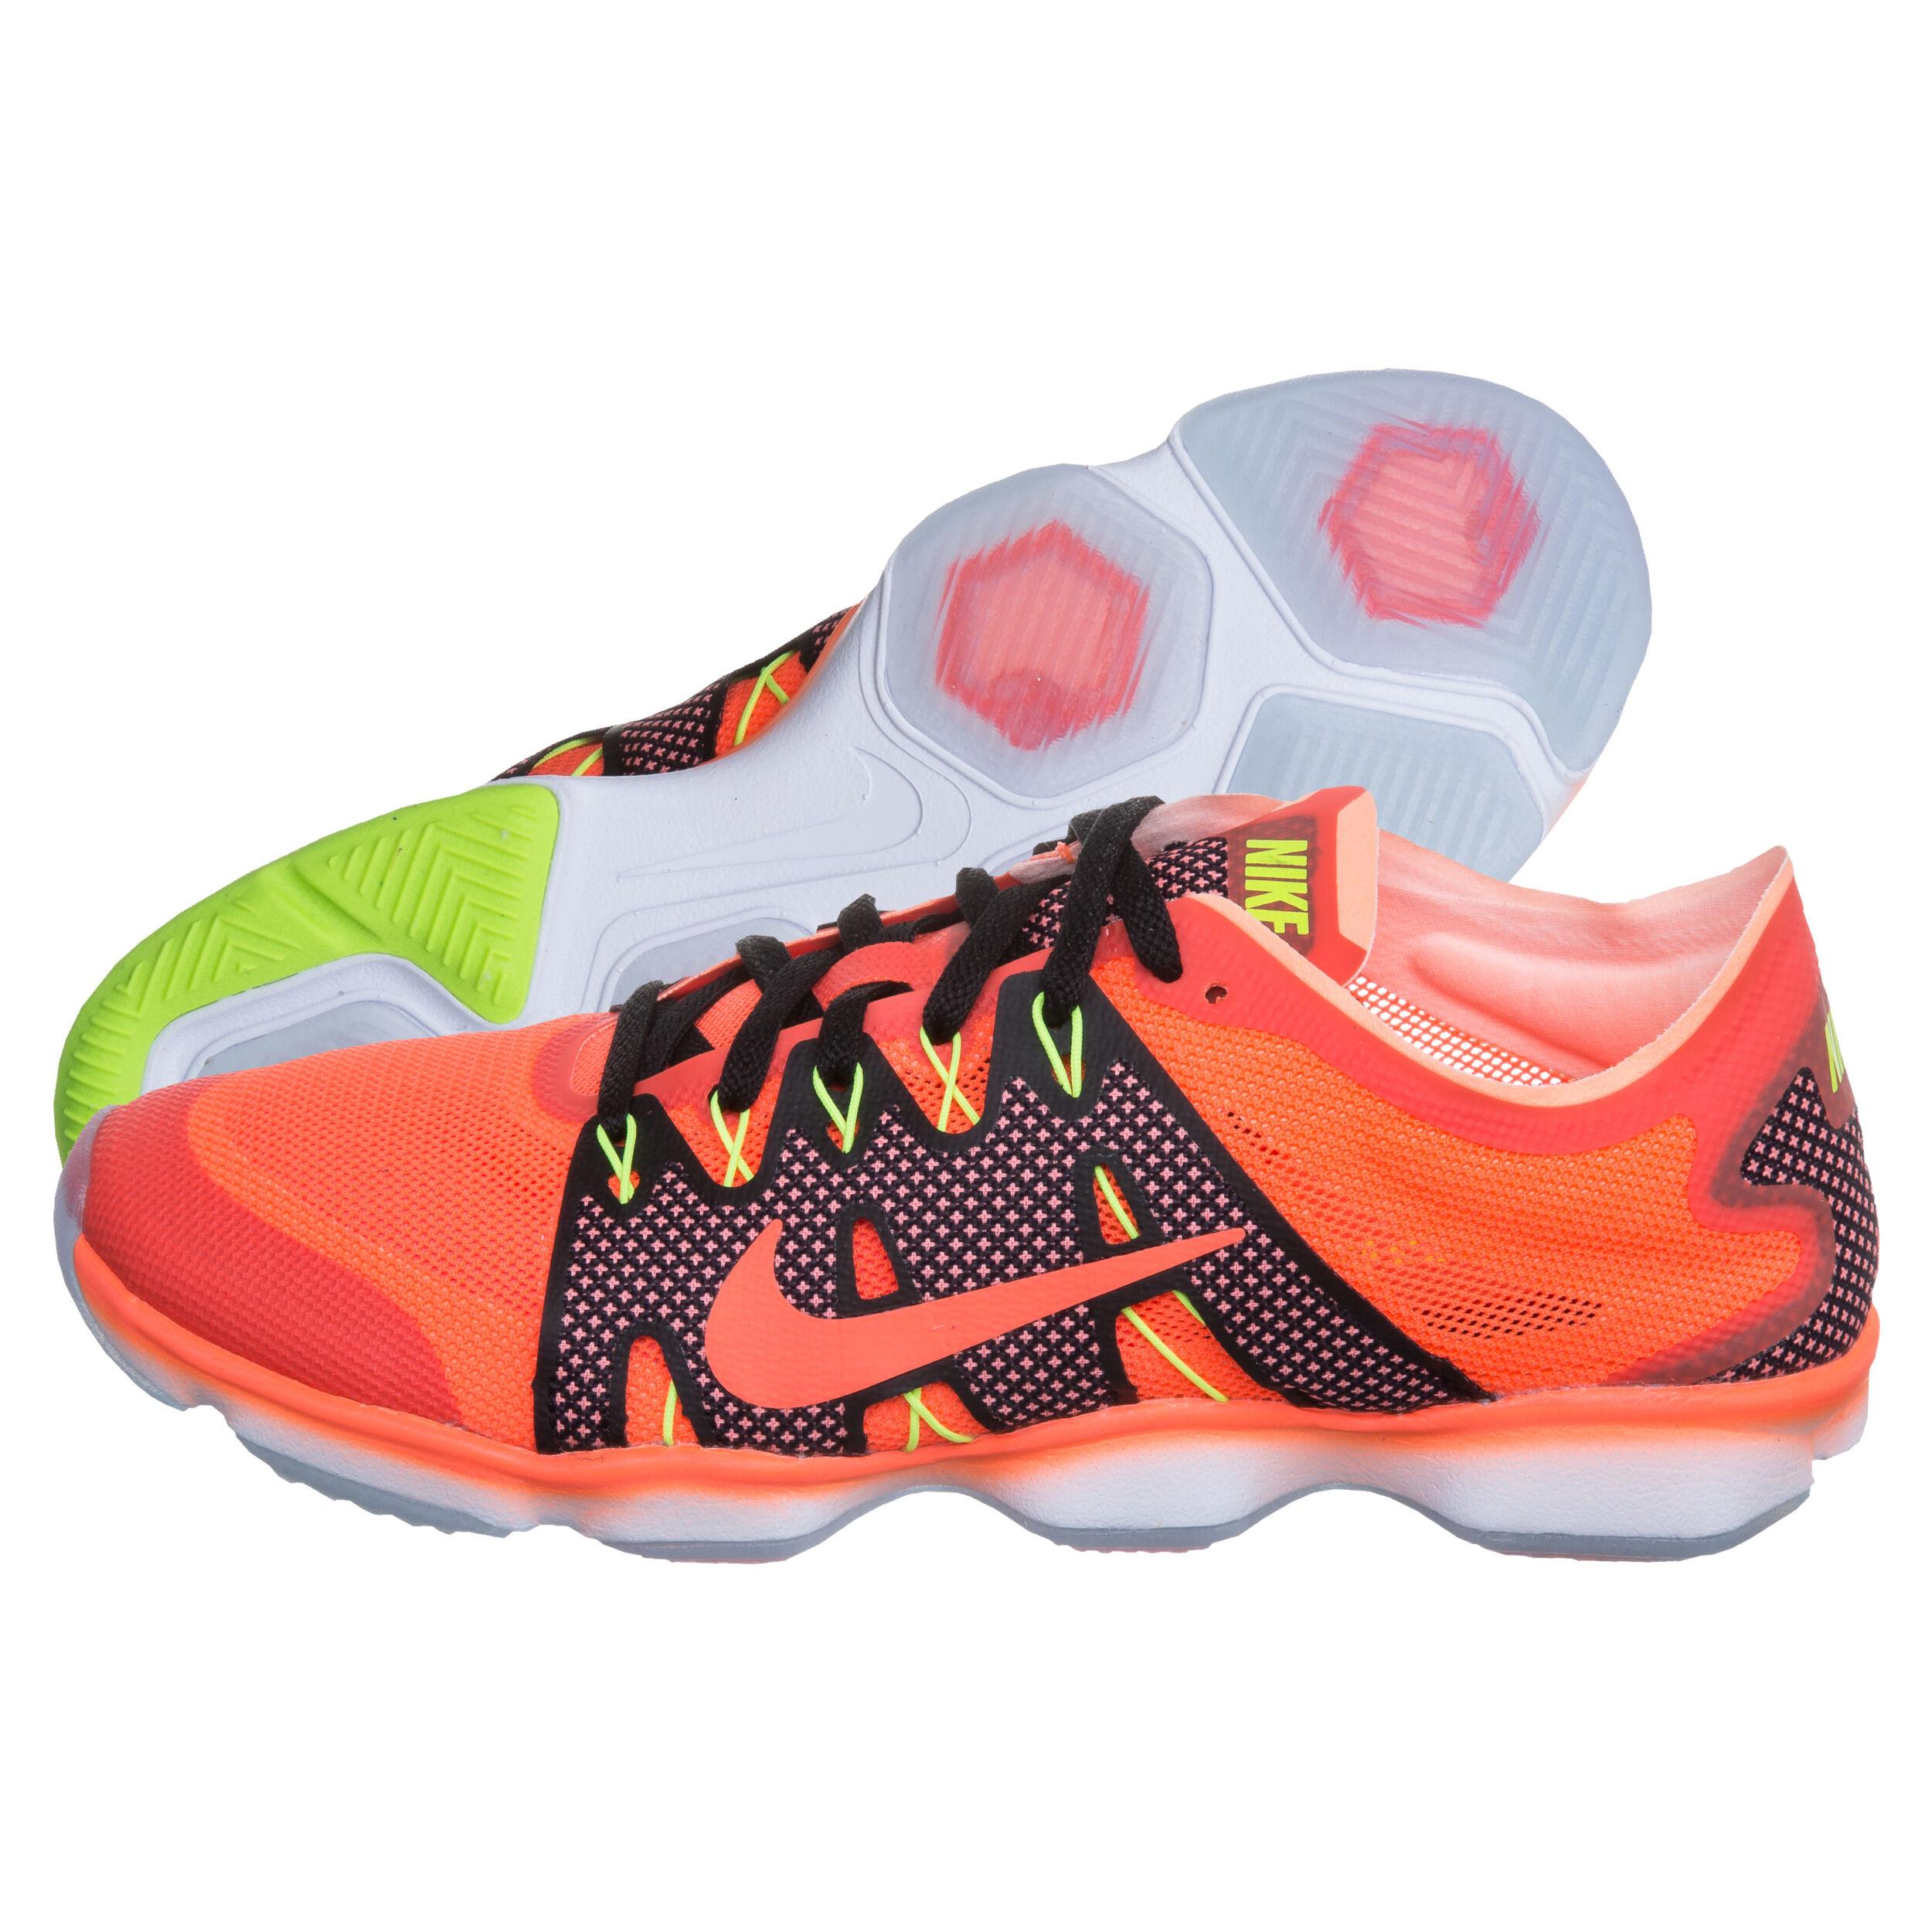 best service huge sale cozy fresh Fitnessschuhe Damen Nike Zoom Fit Agility 2 Fitnessschuh